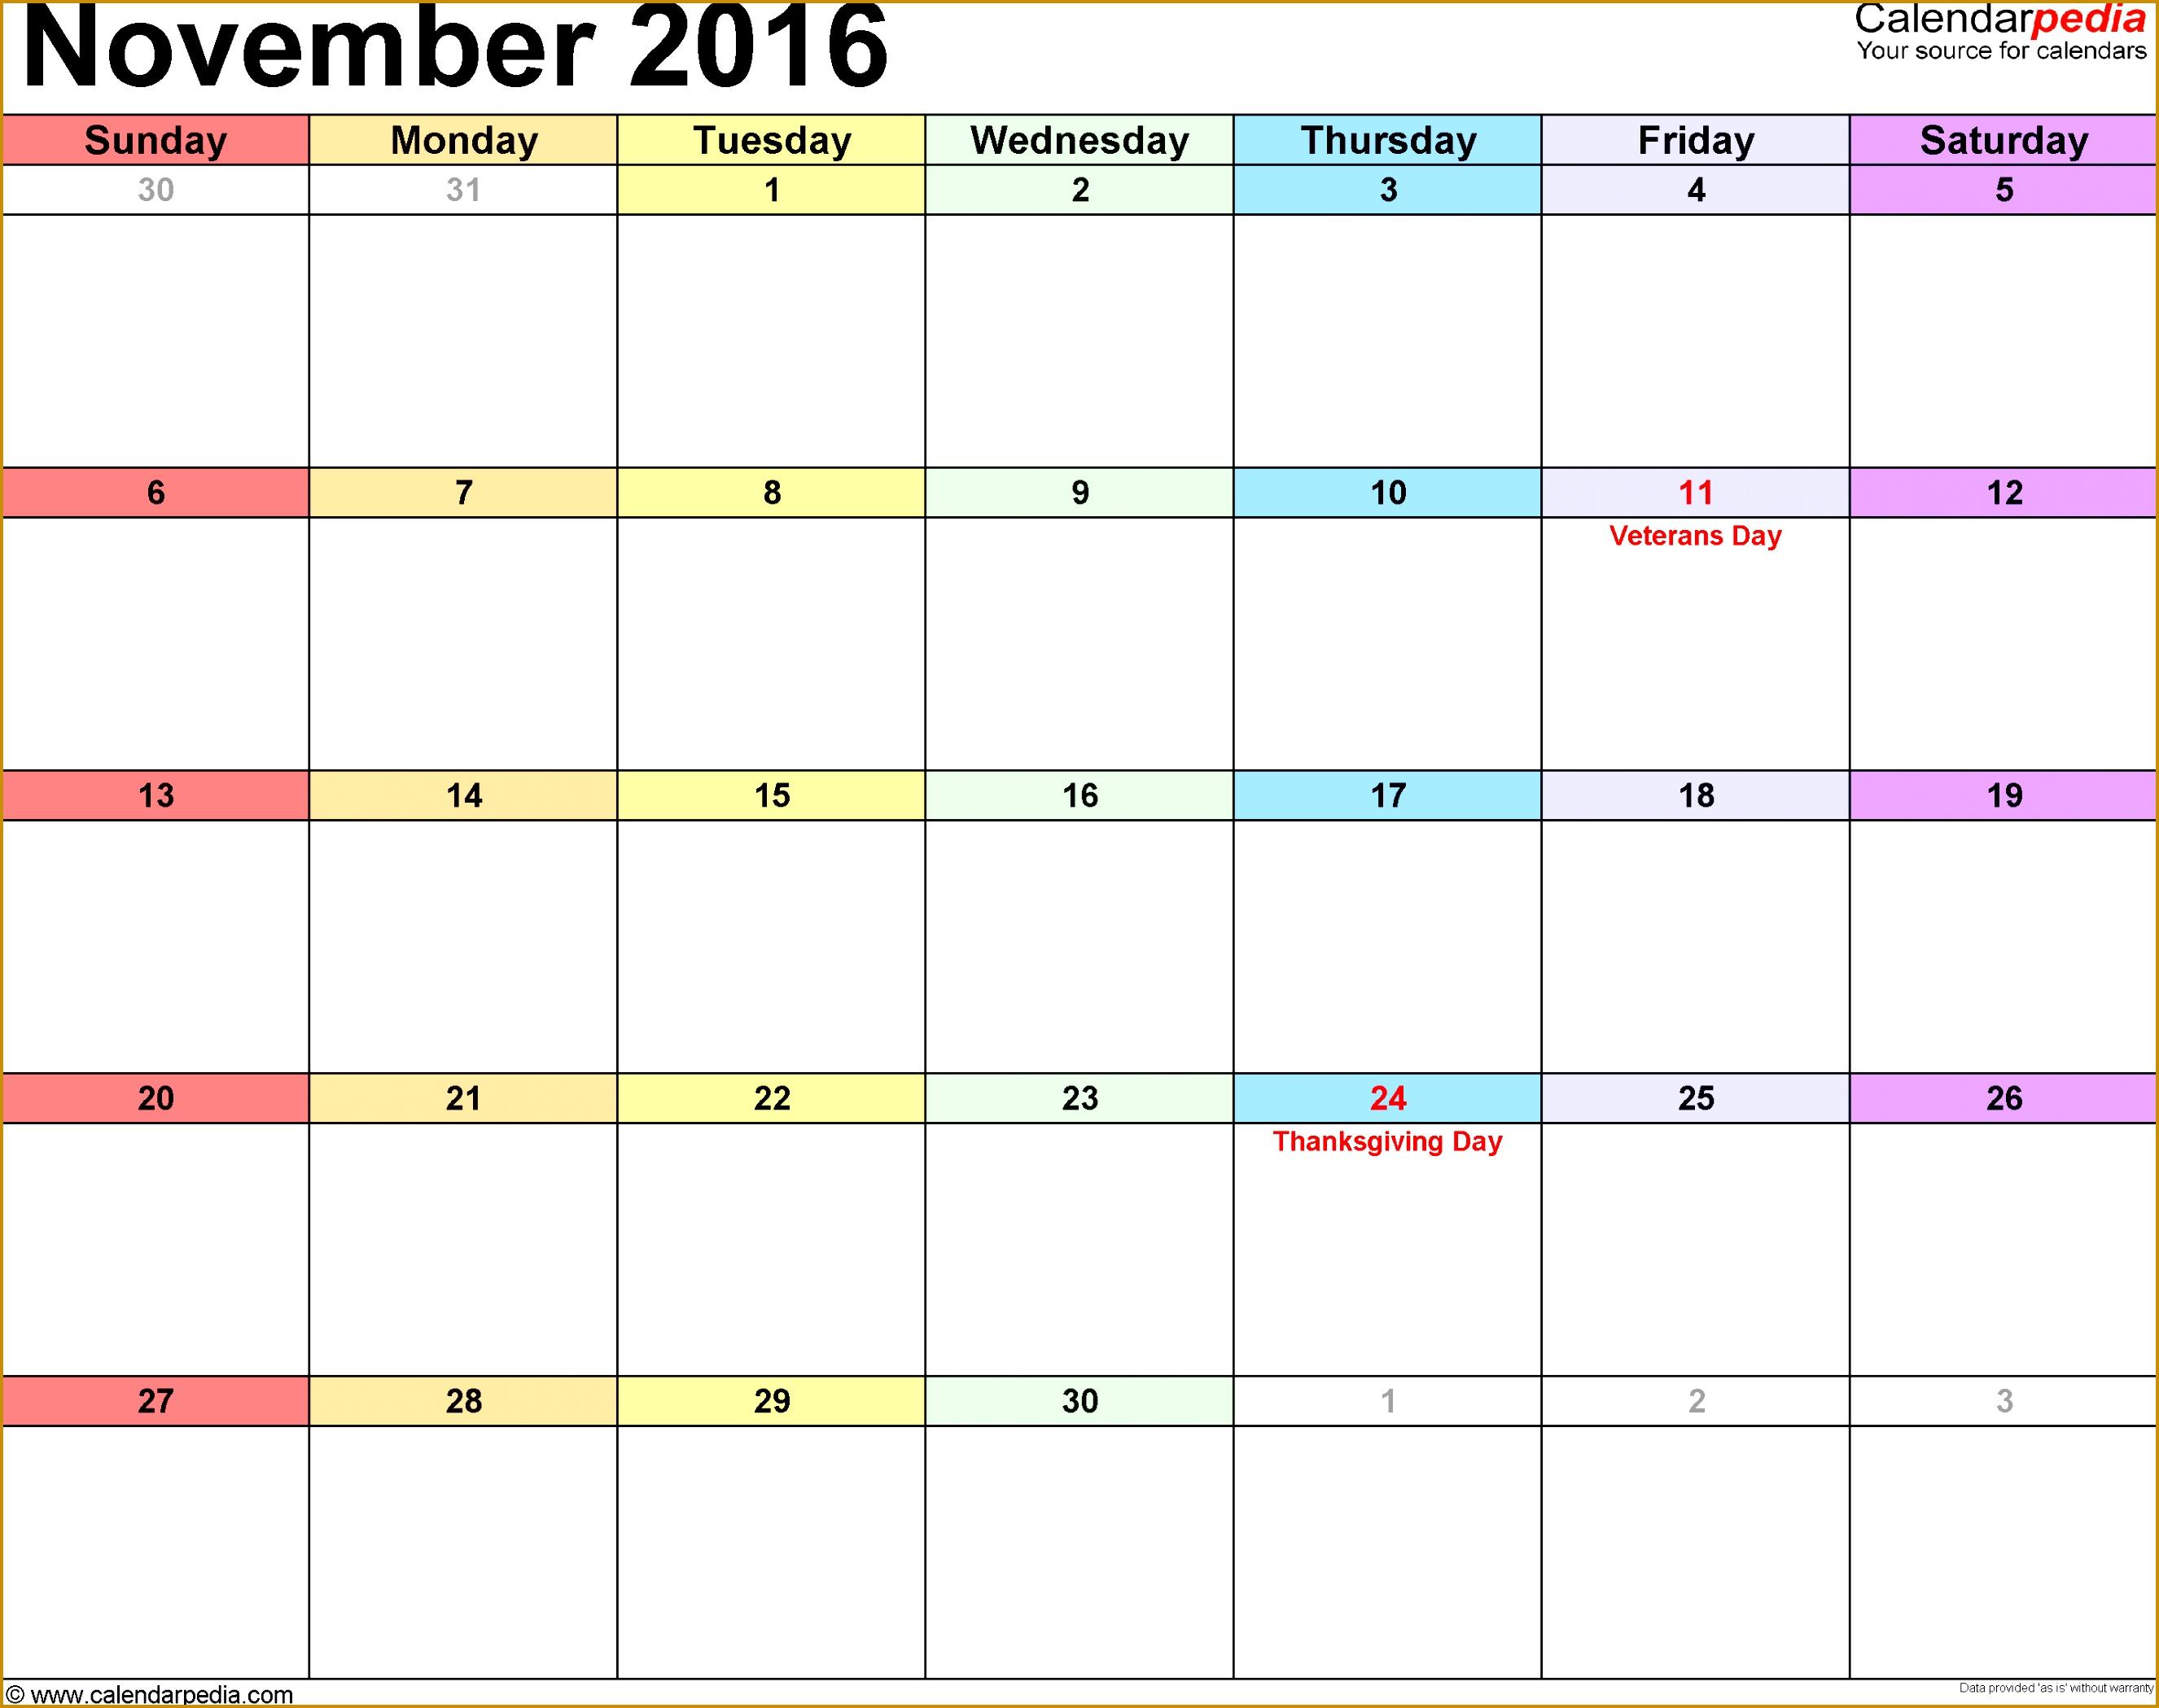 November 2016 calendar printable template 20982652